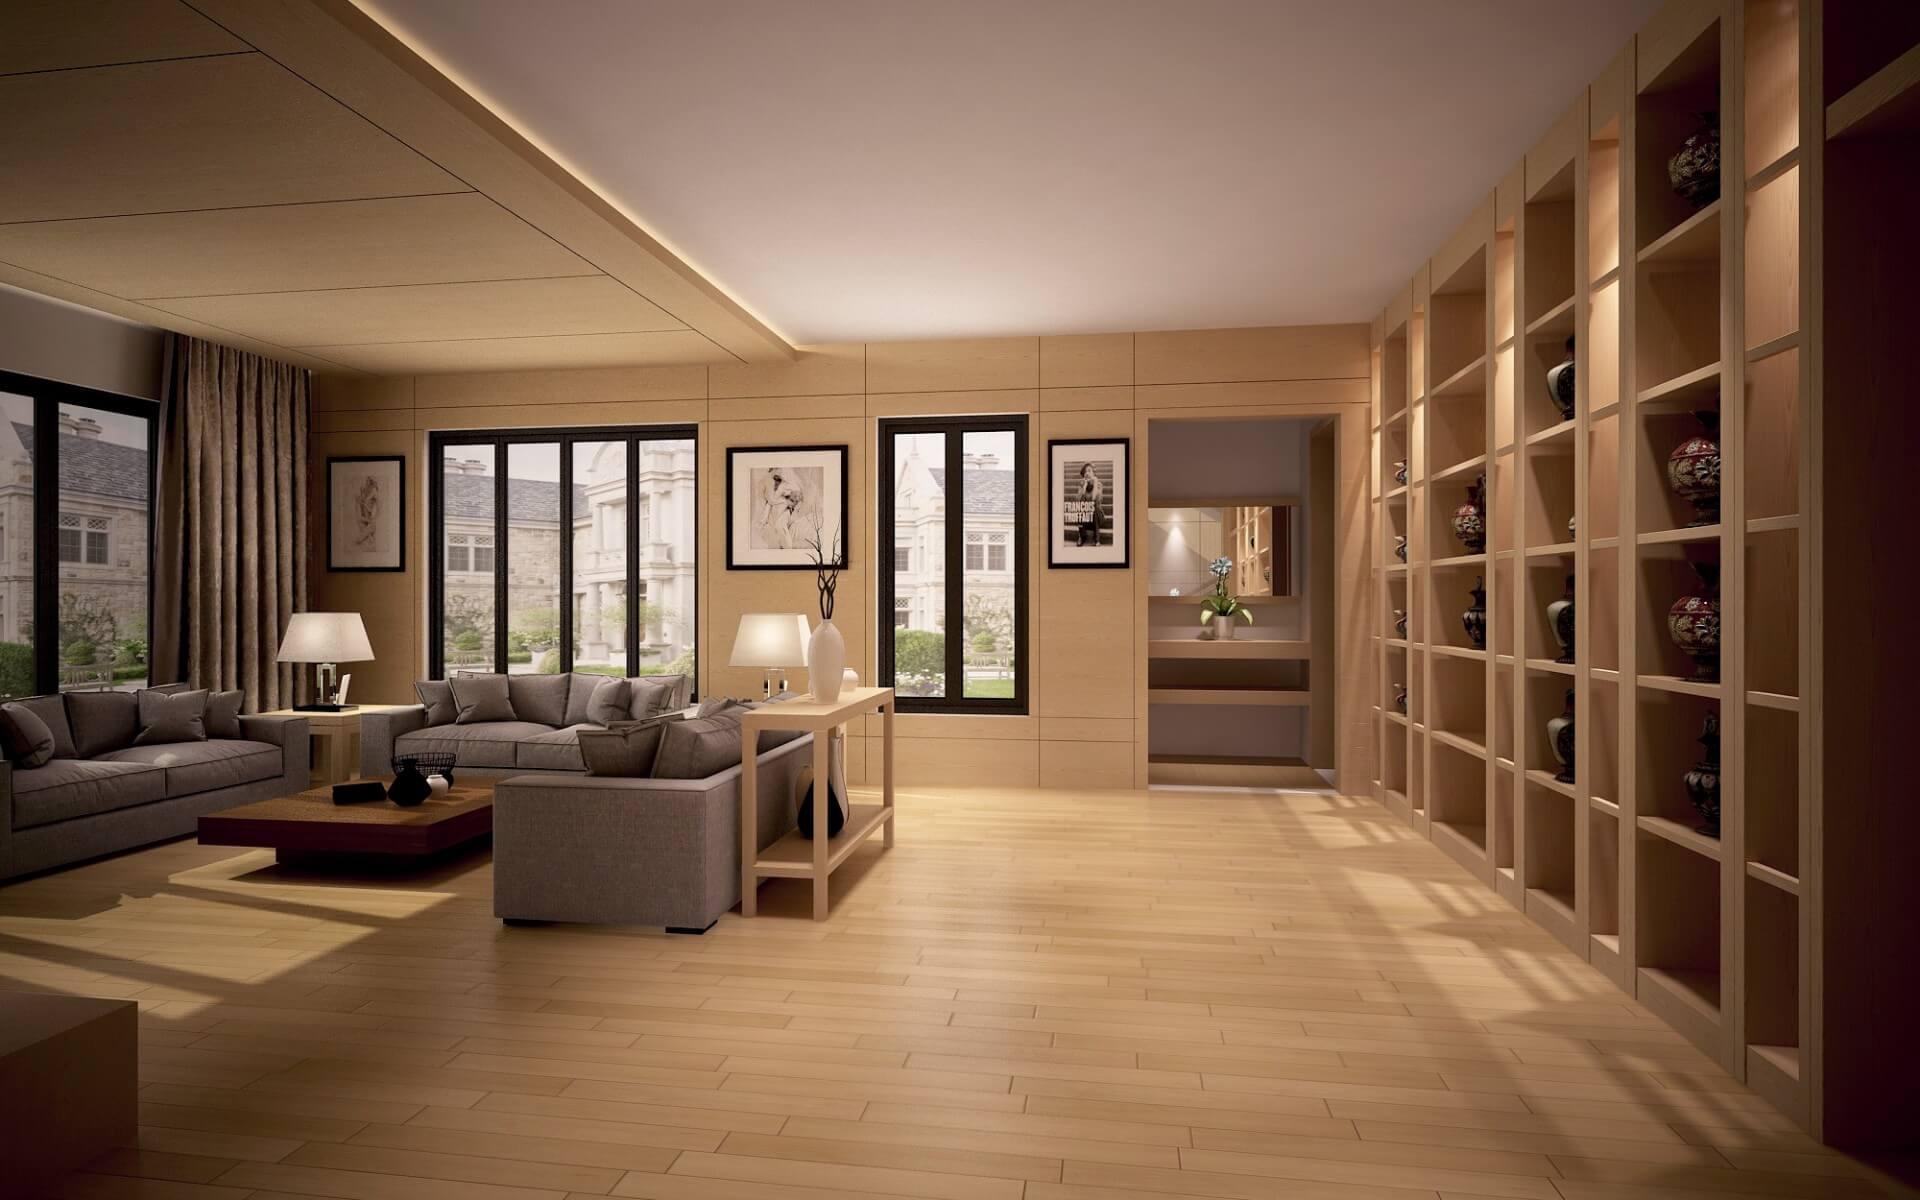 Hanoi Apartments For Rent | Hanoi Houses, Properties